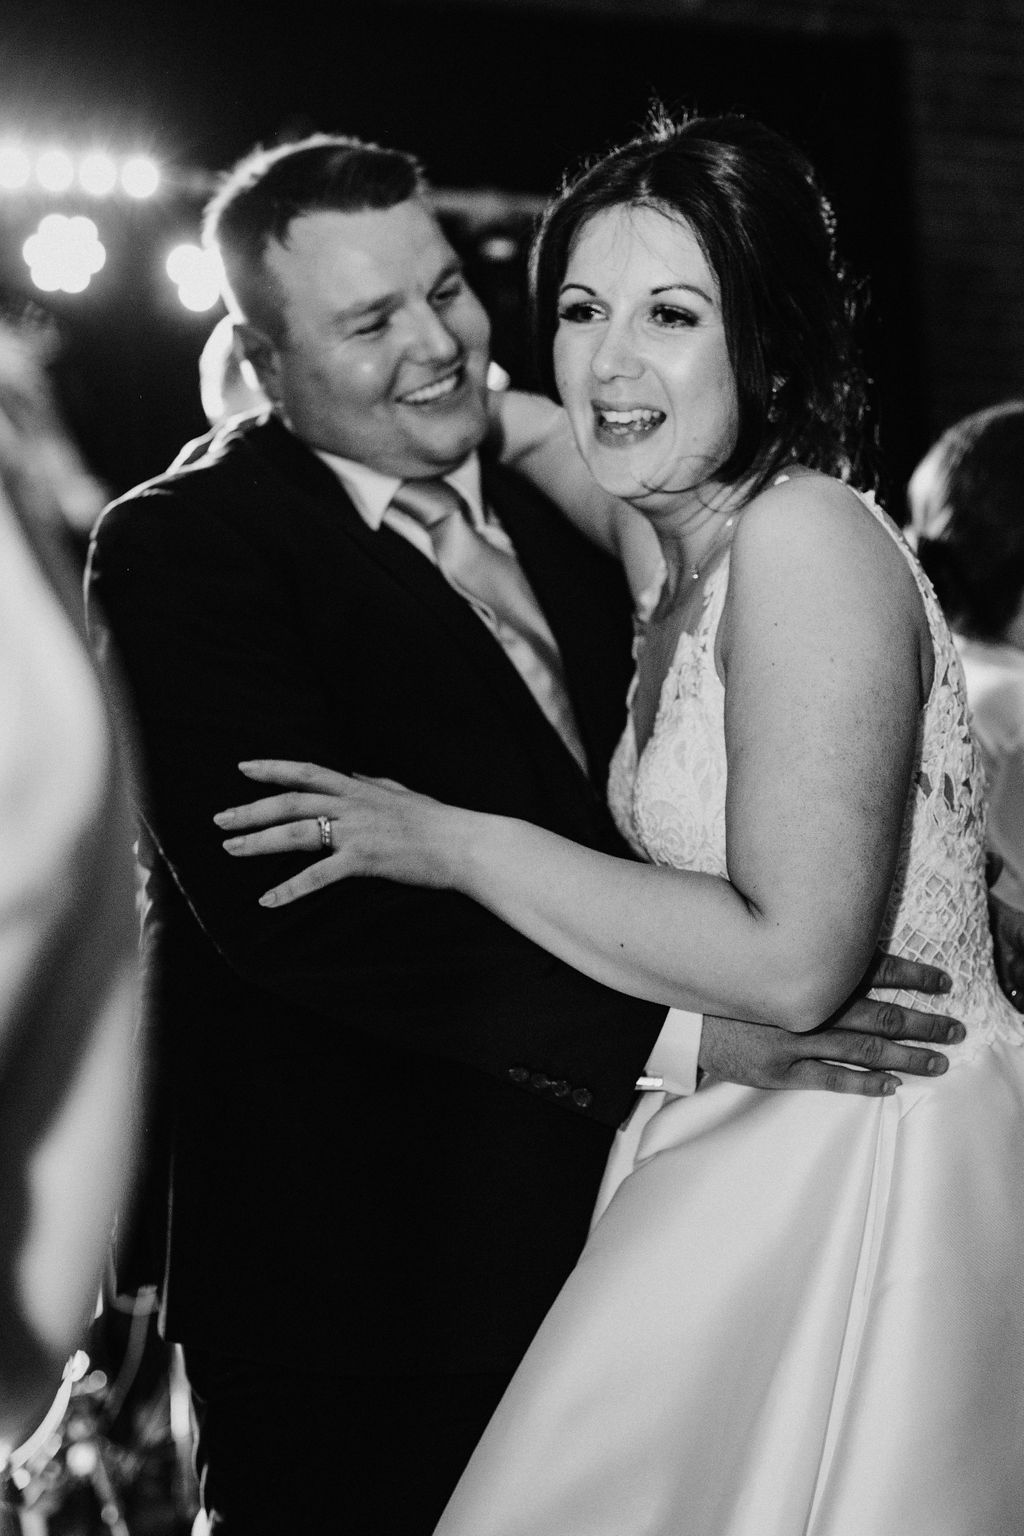 Your_Wedding_Day_633.jpg